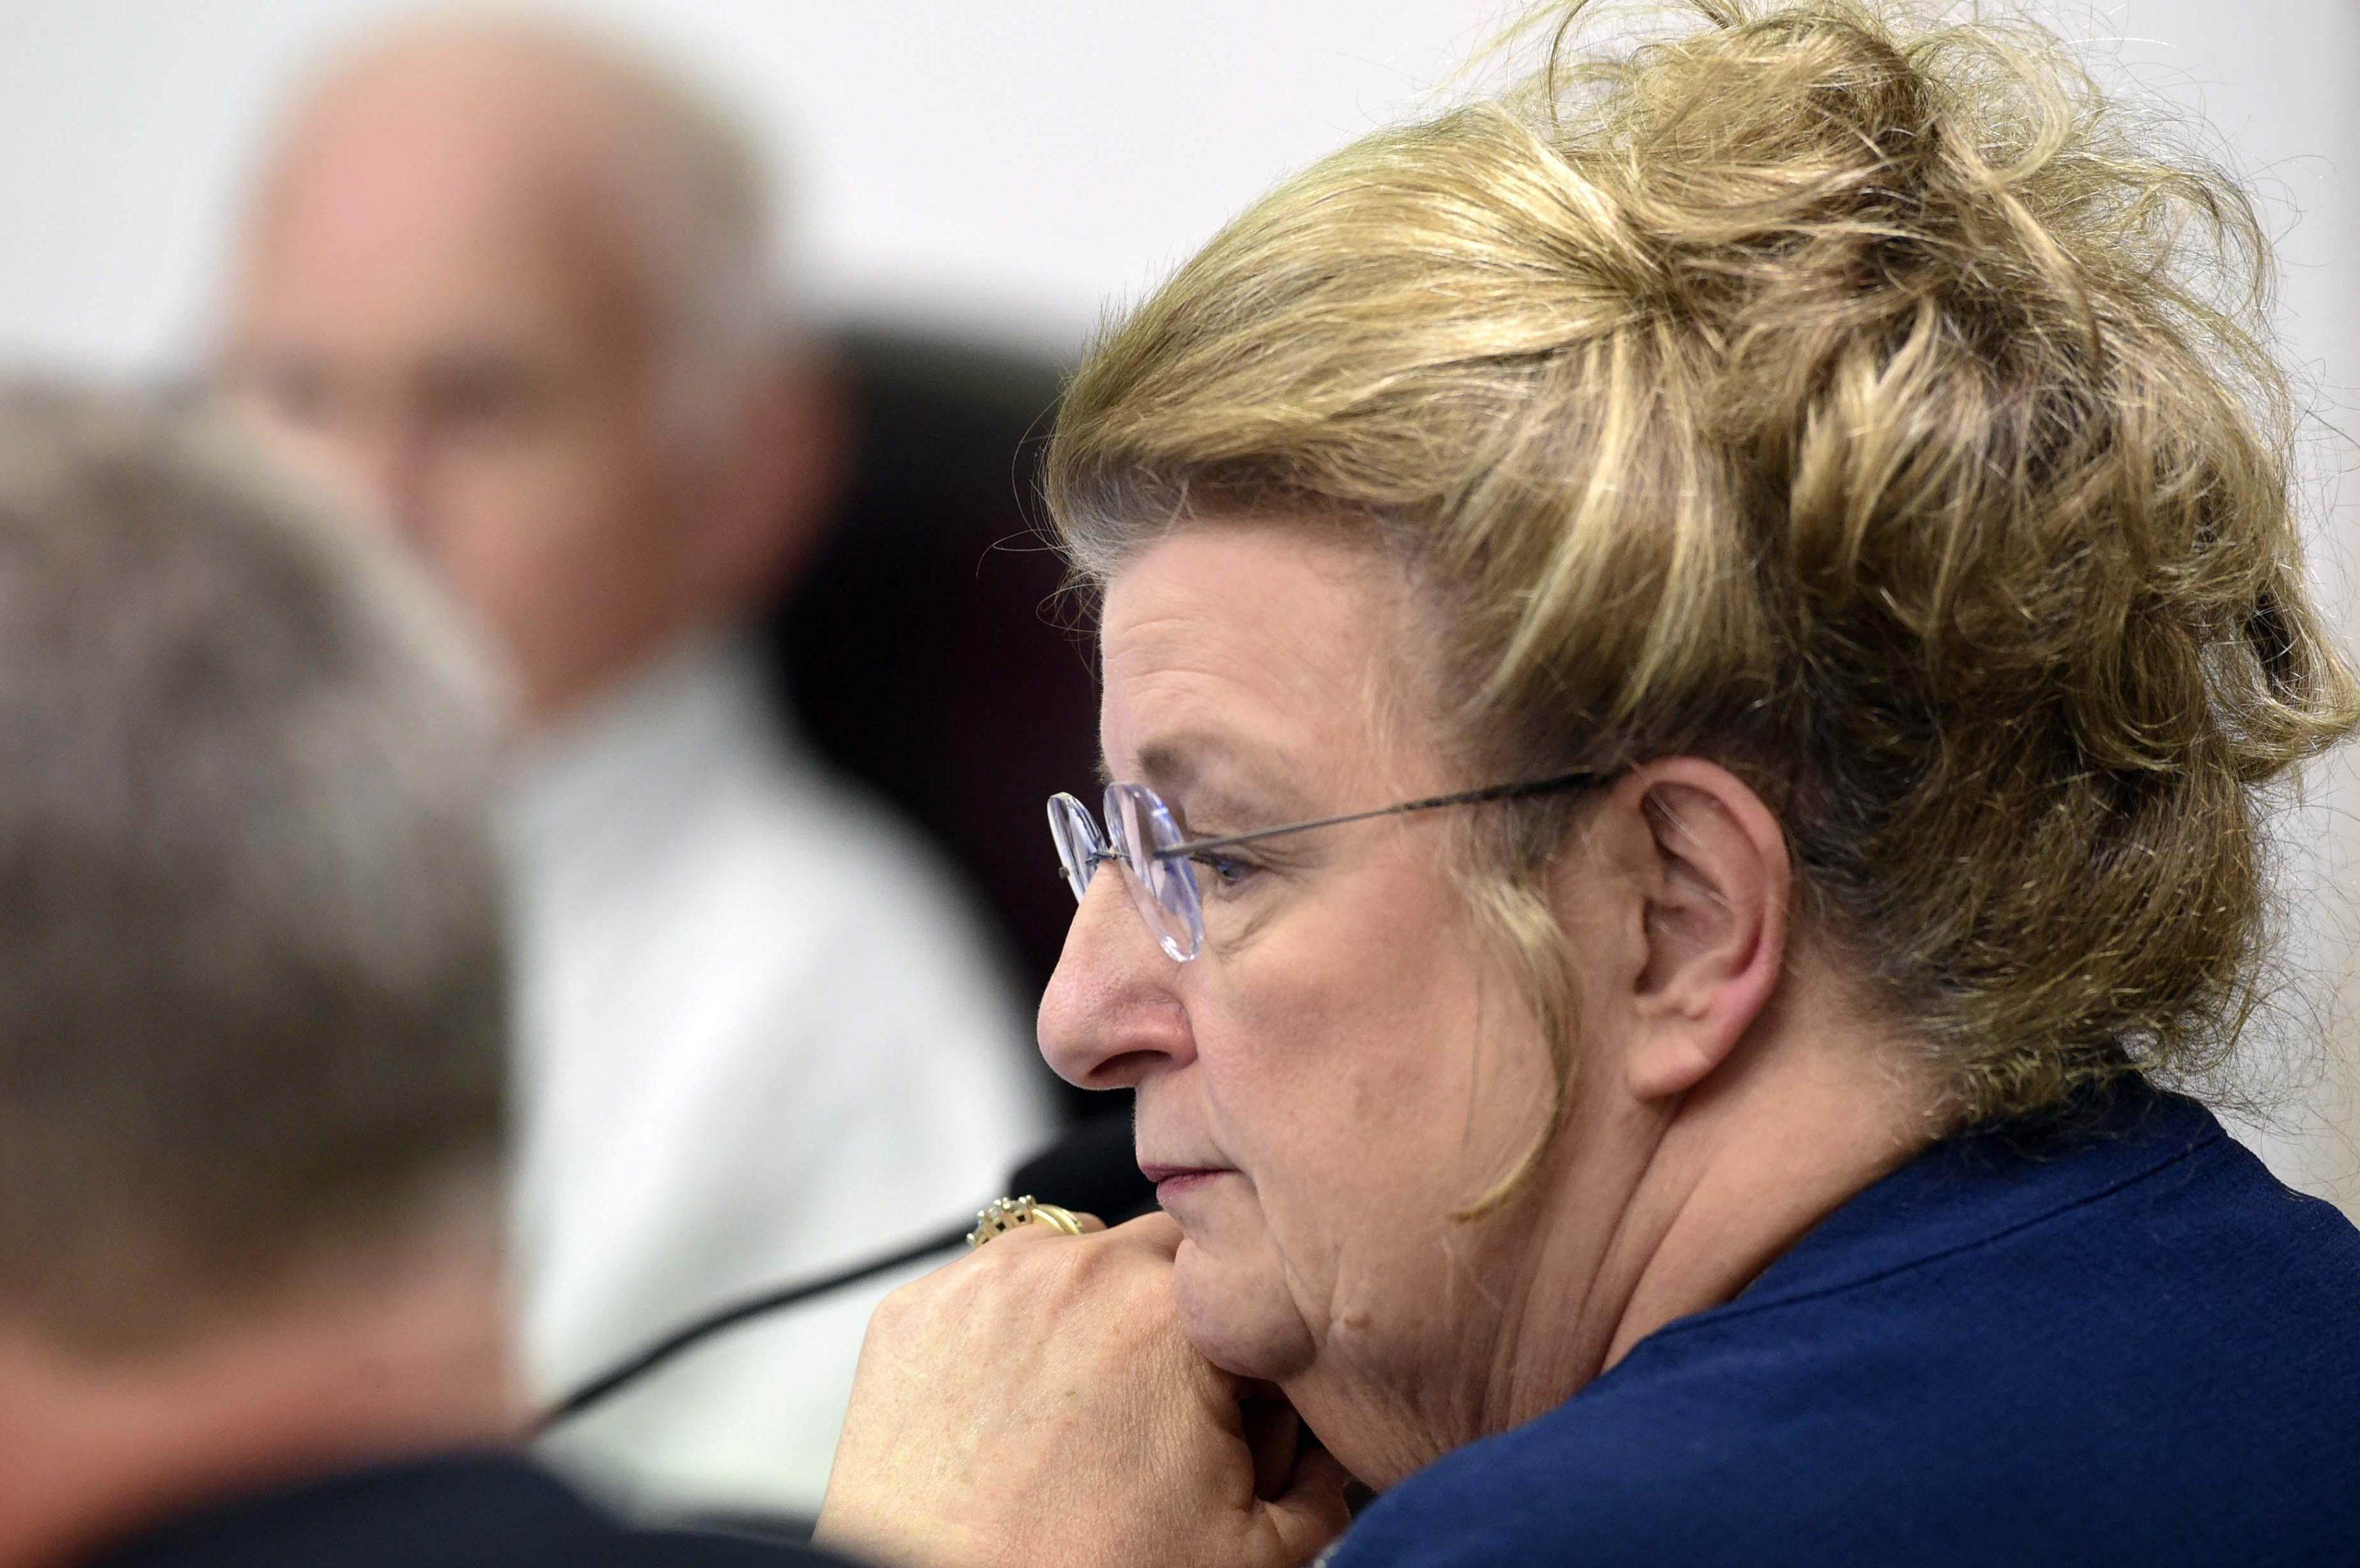 Okaloosa-County-Superintendent-of-Schools-Mary-Beth-Jackson-3500x2326.jpg